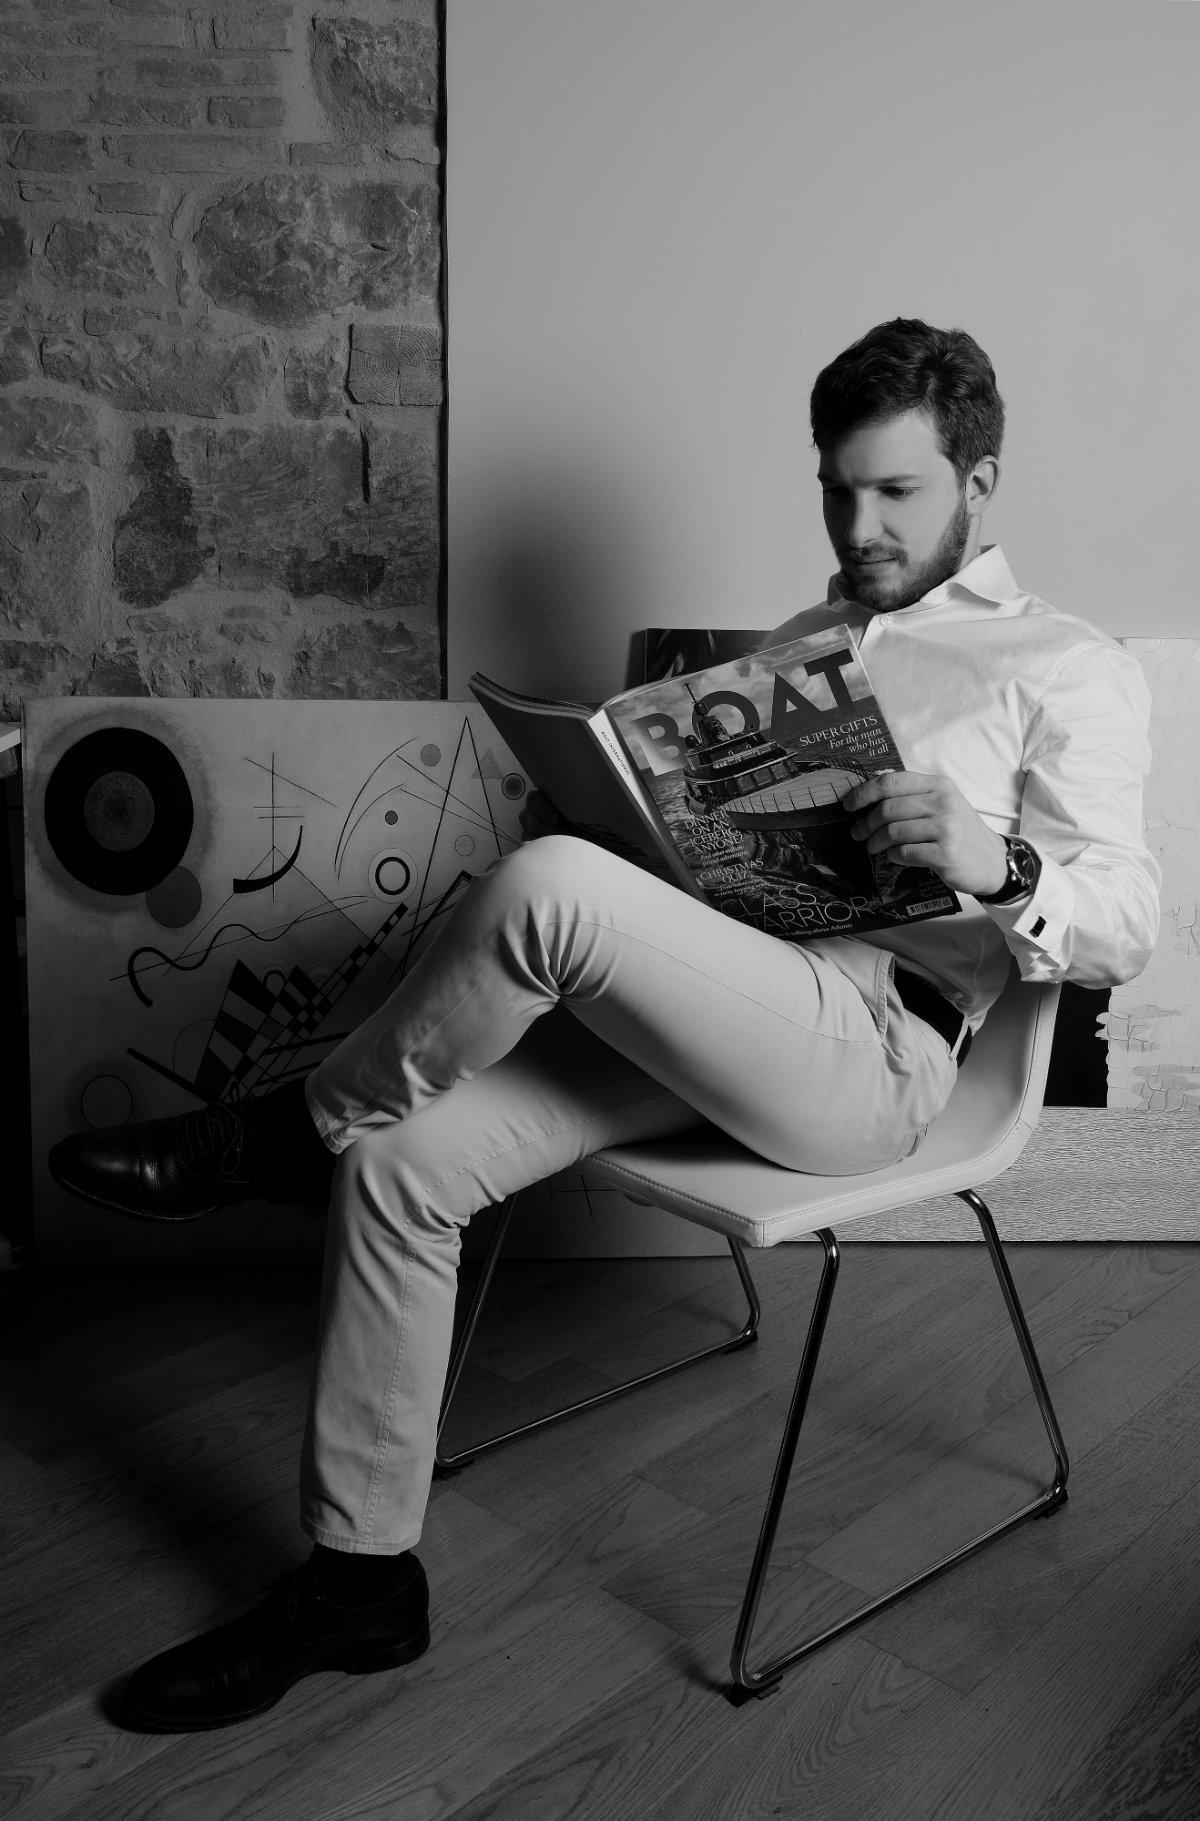 Gabriele-TERUZZI-INTERVISTA-DESIGNLIFESTYLE